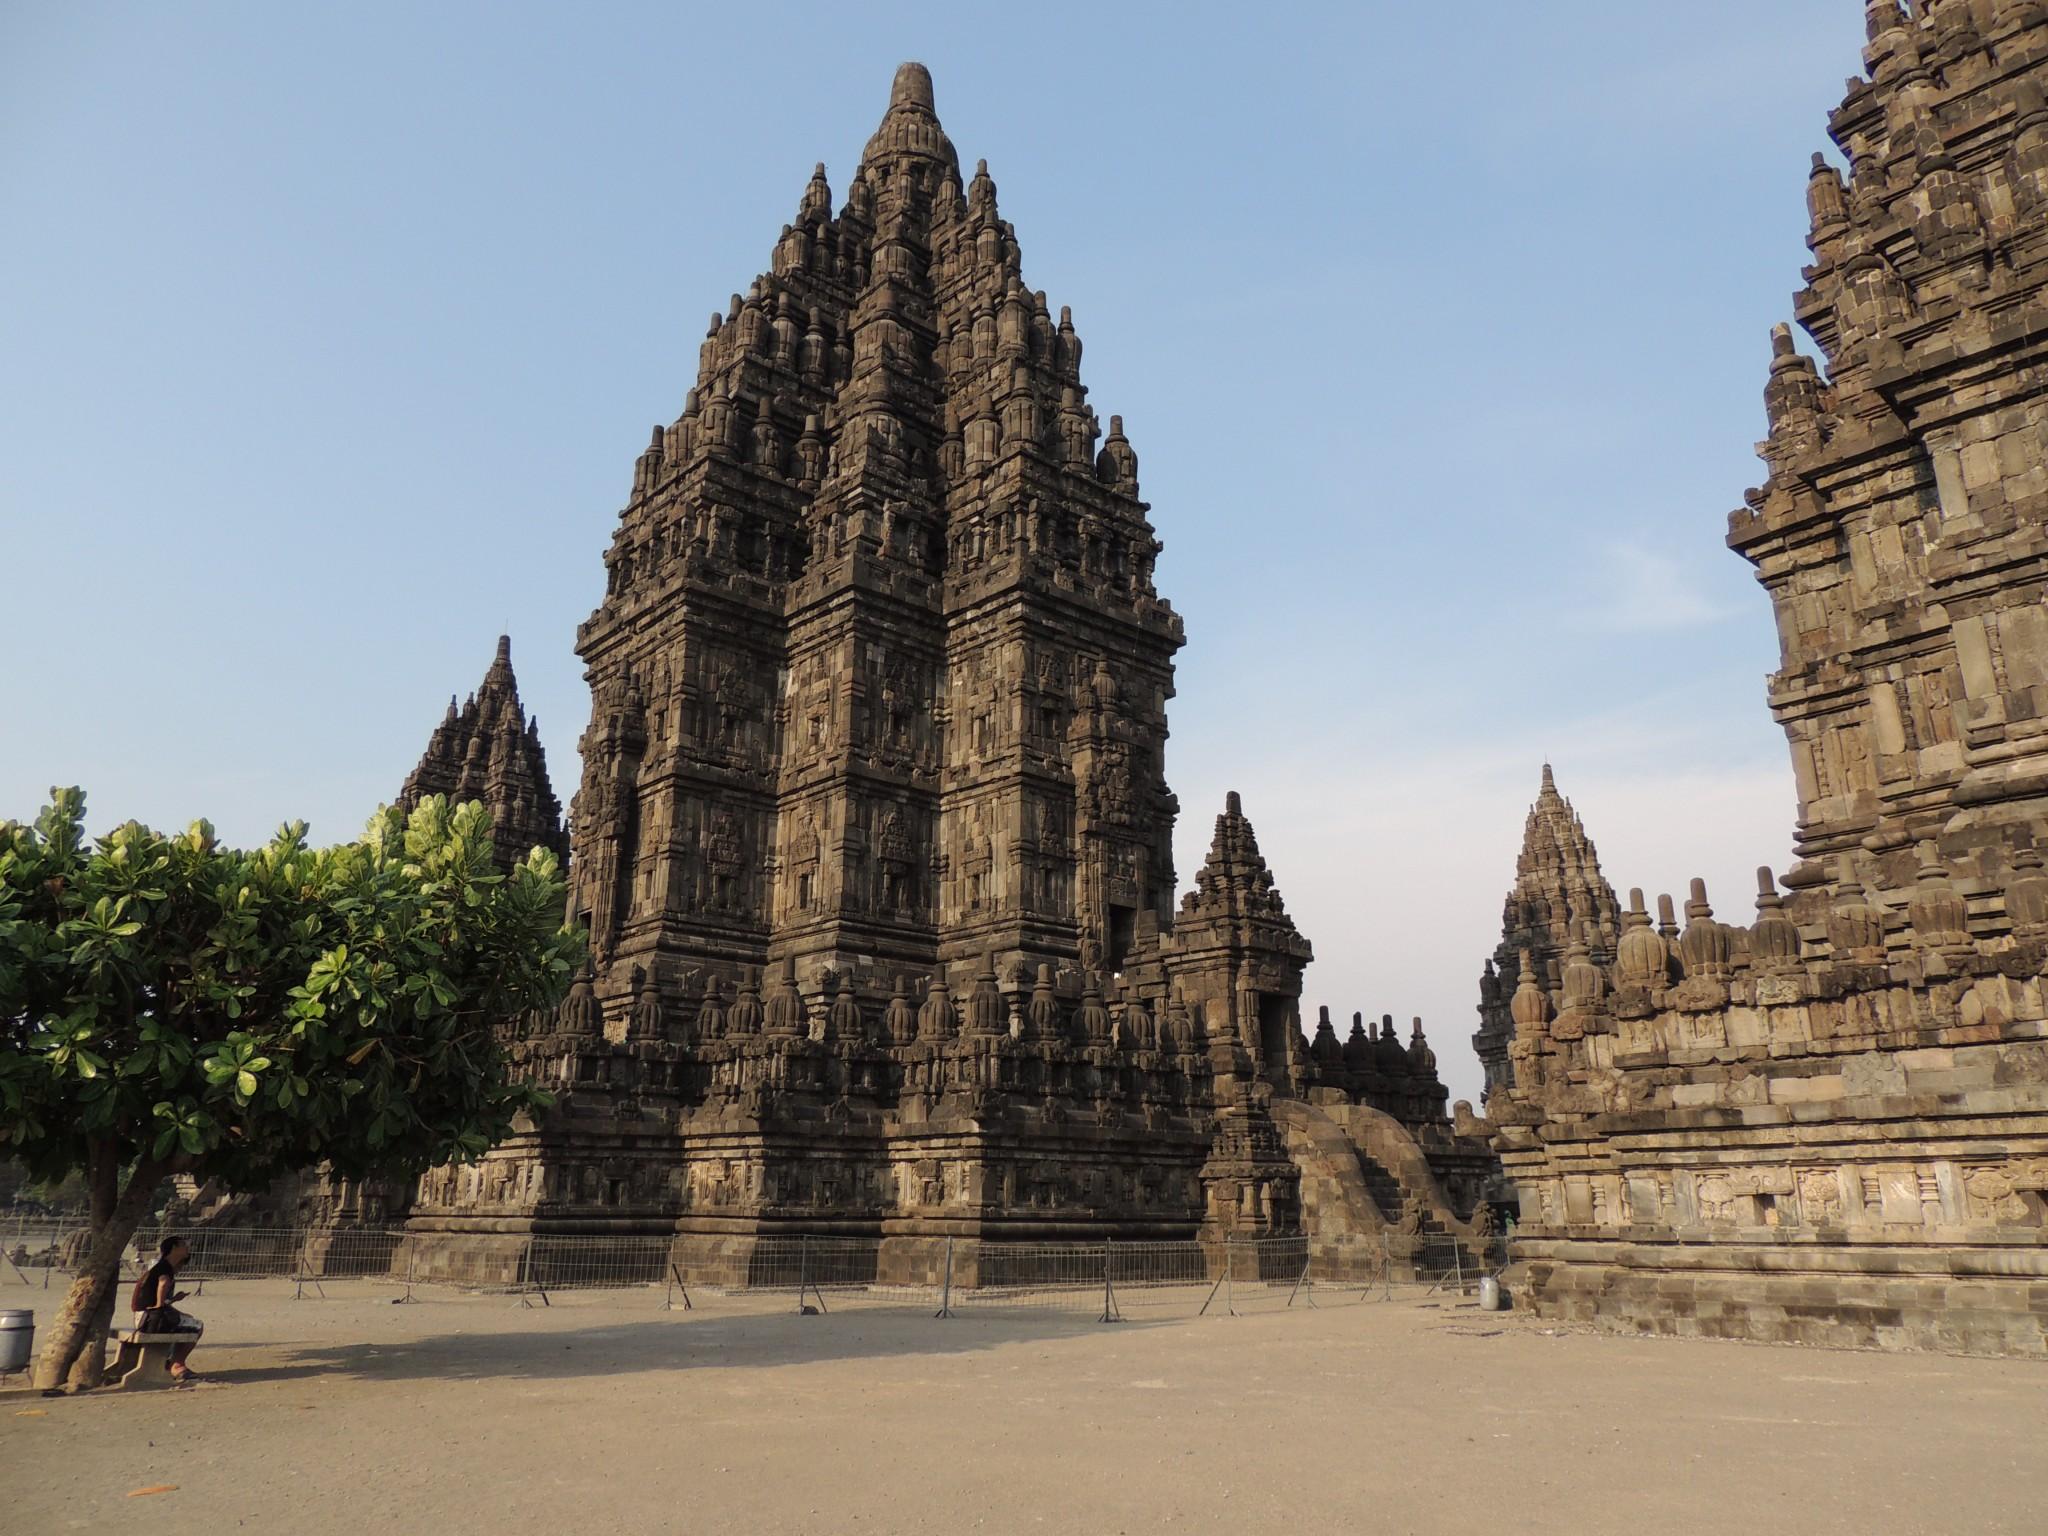 Indonesië, Prambanan temple in Yogyakarta